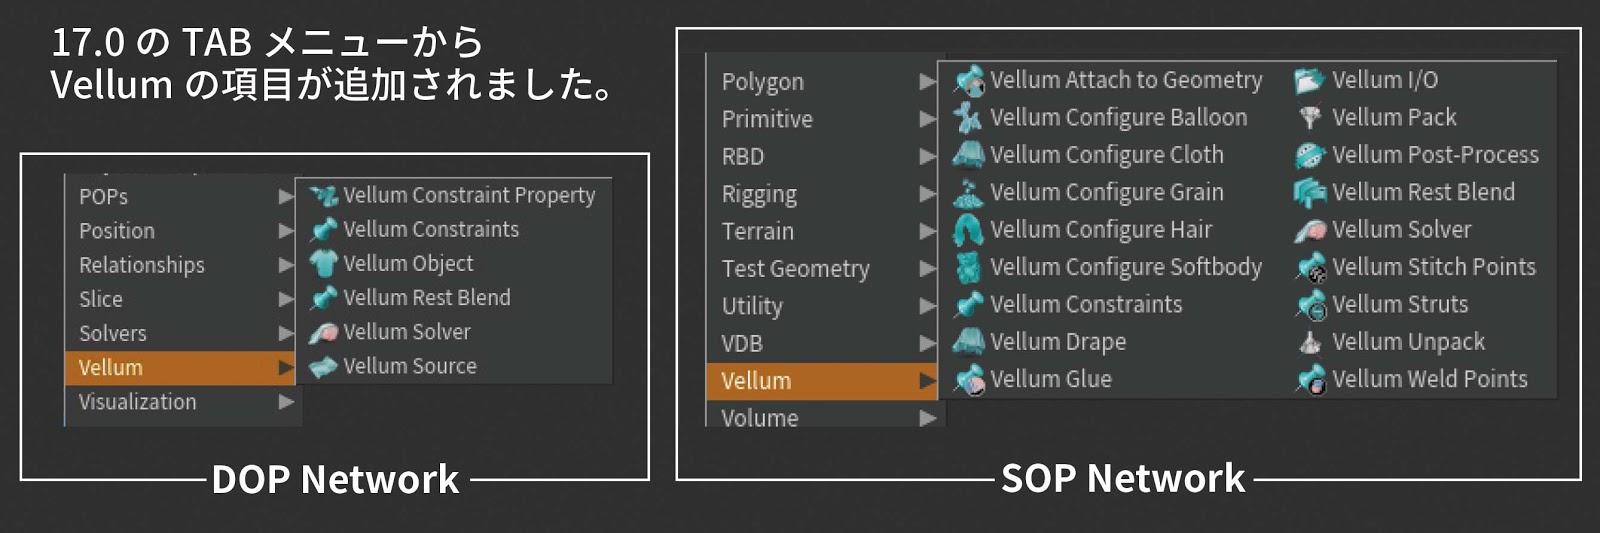 Vellum 機能 | インディゾーンHoudini情報日本語ブログ